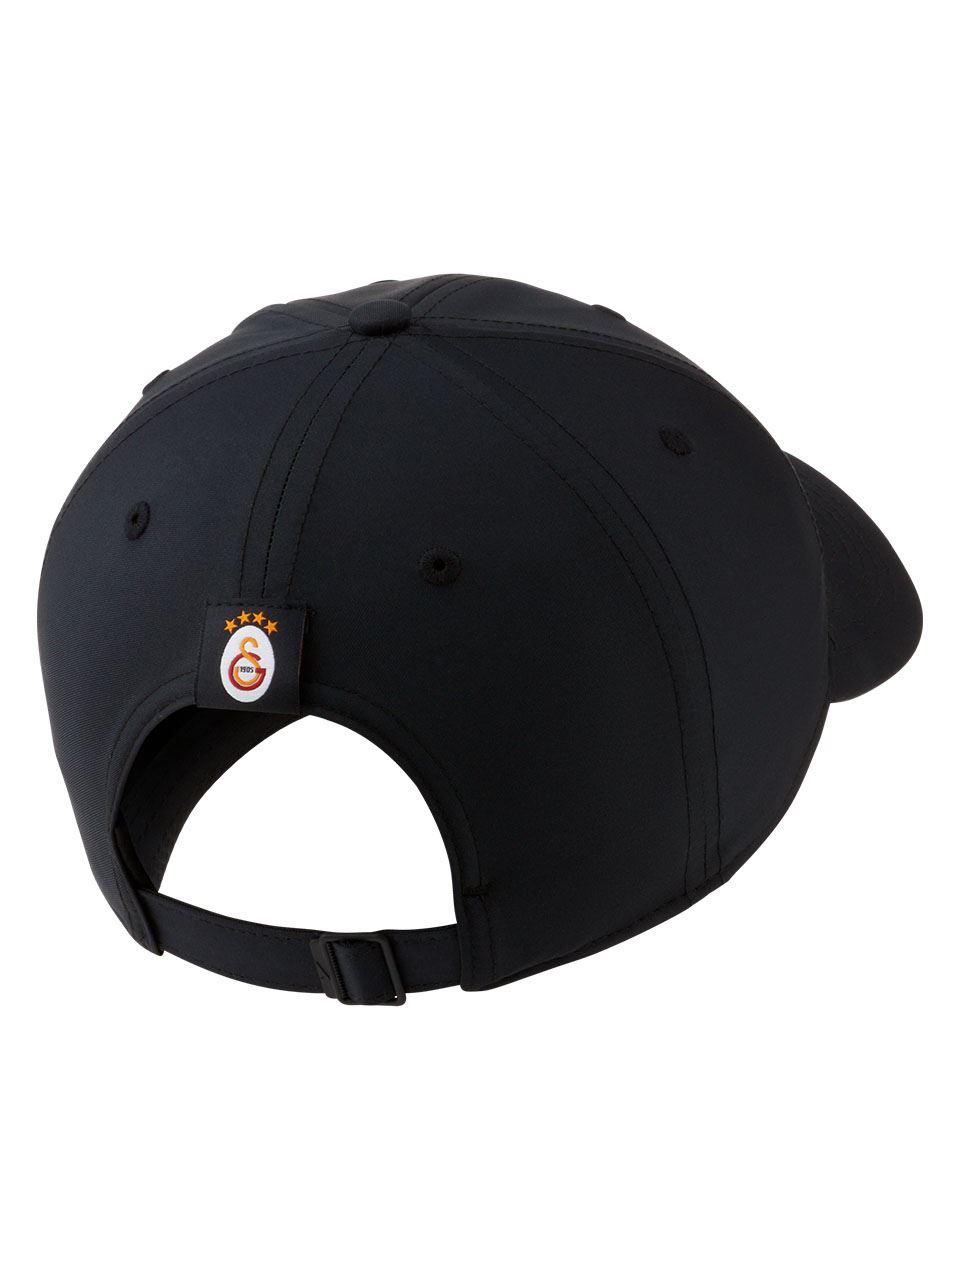 Nike Galatasaray Şapka DH2383-010